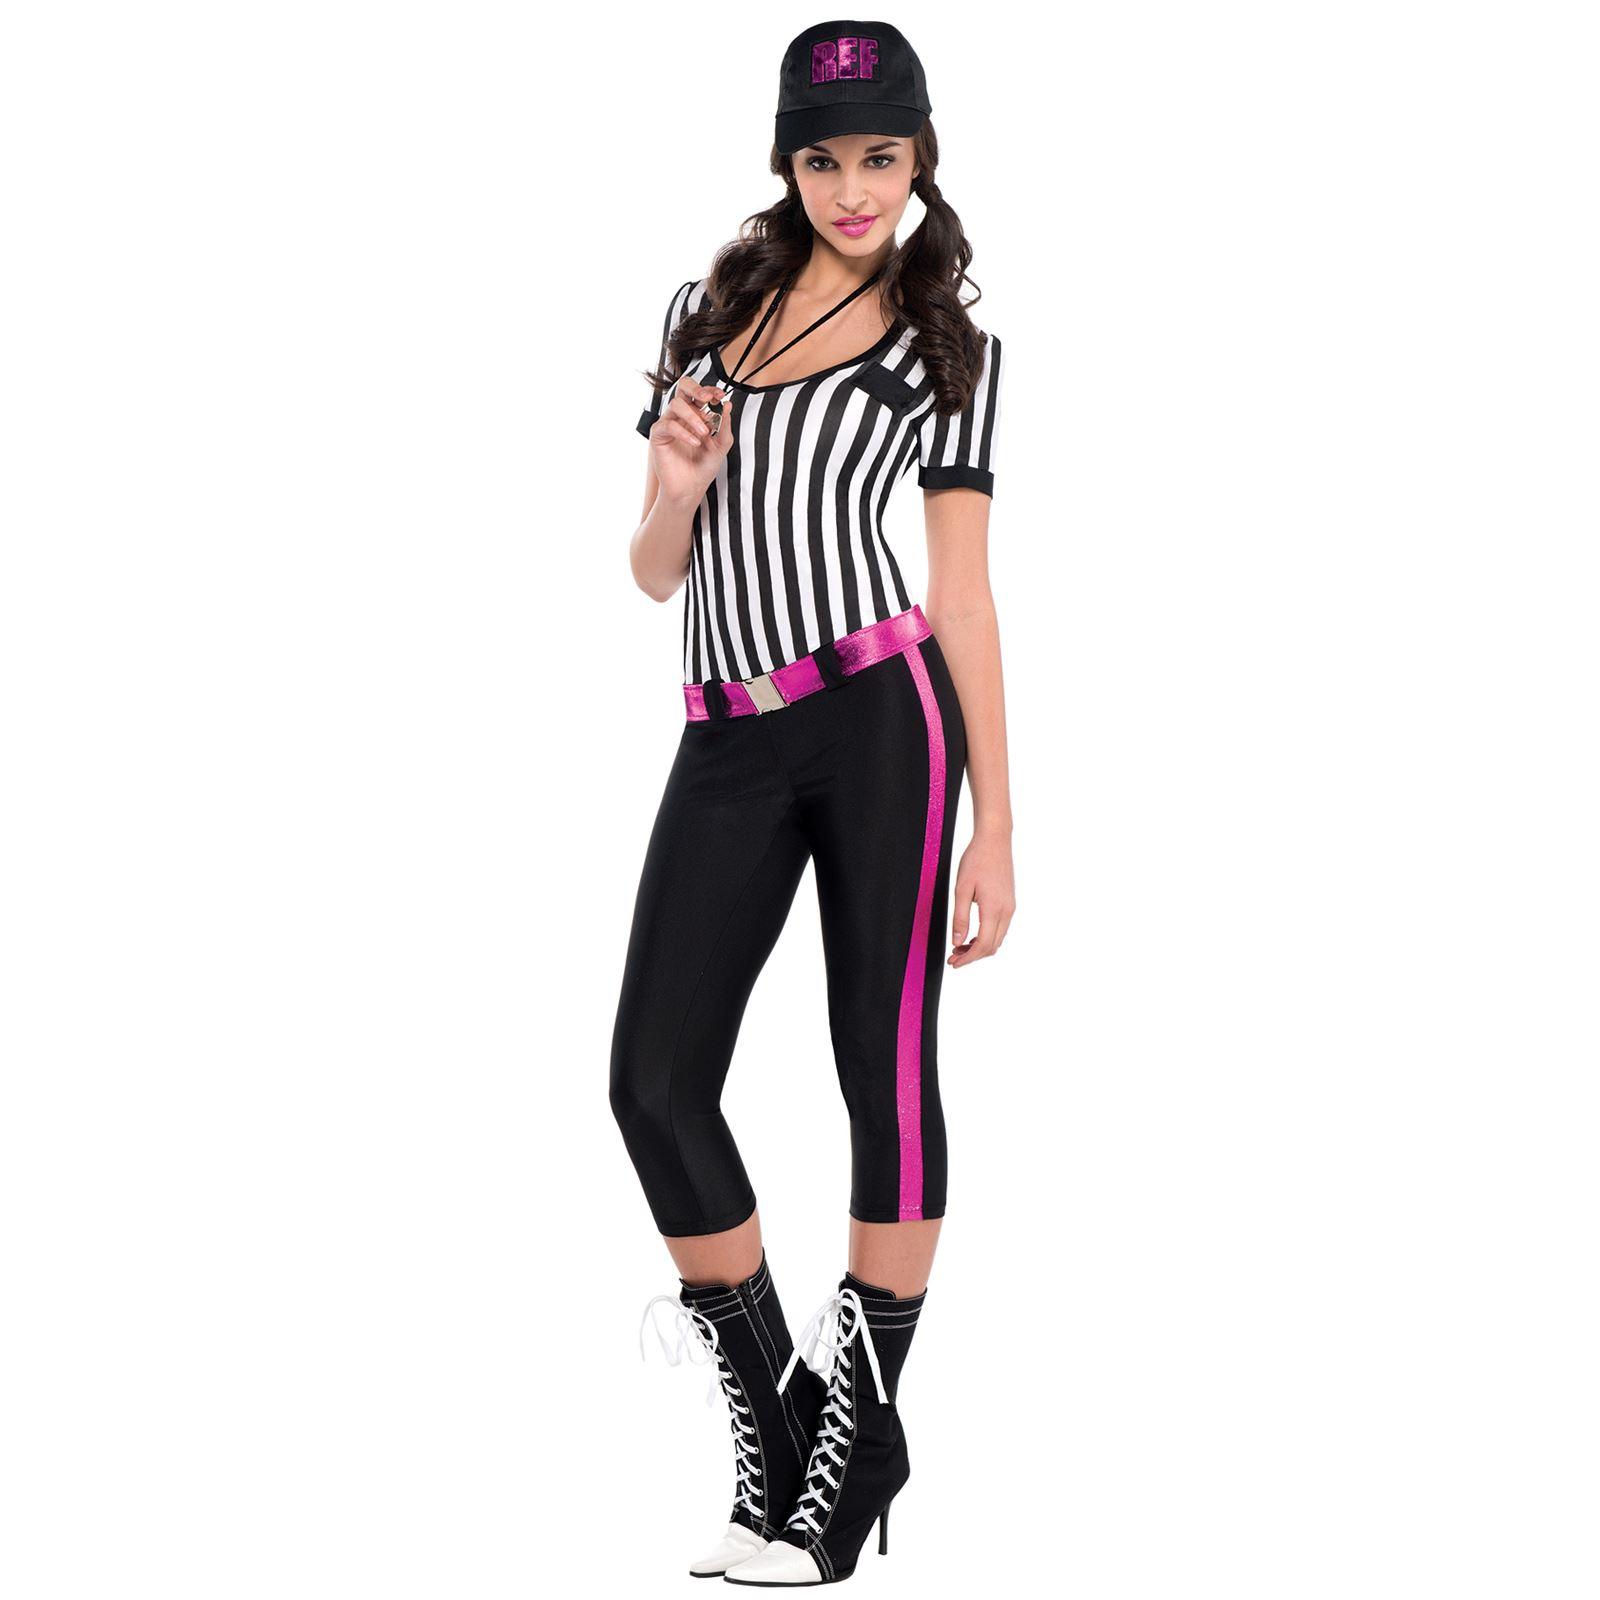 sexy-referee-outfits-berkeley-slut